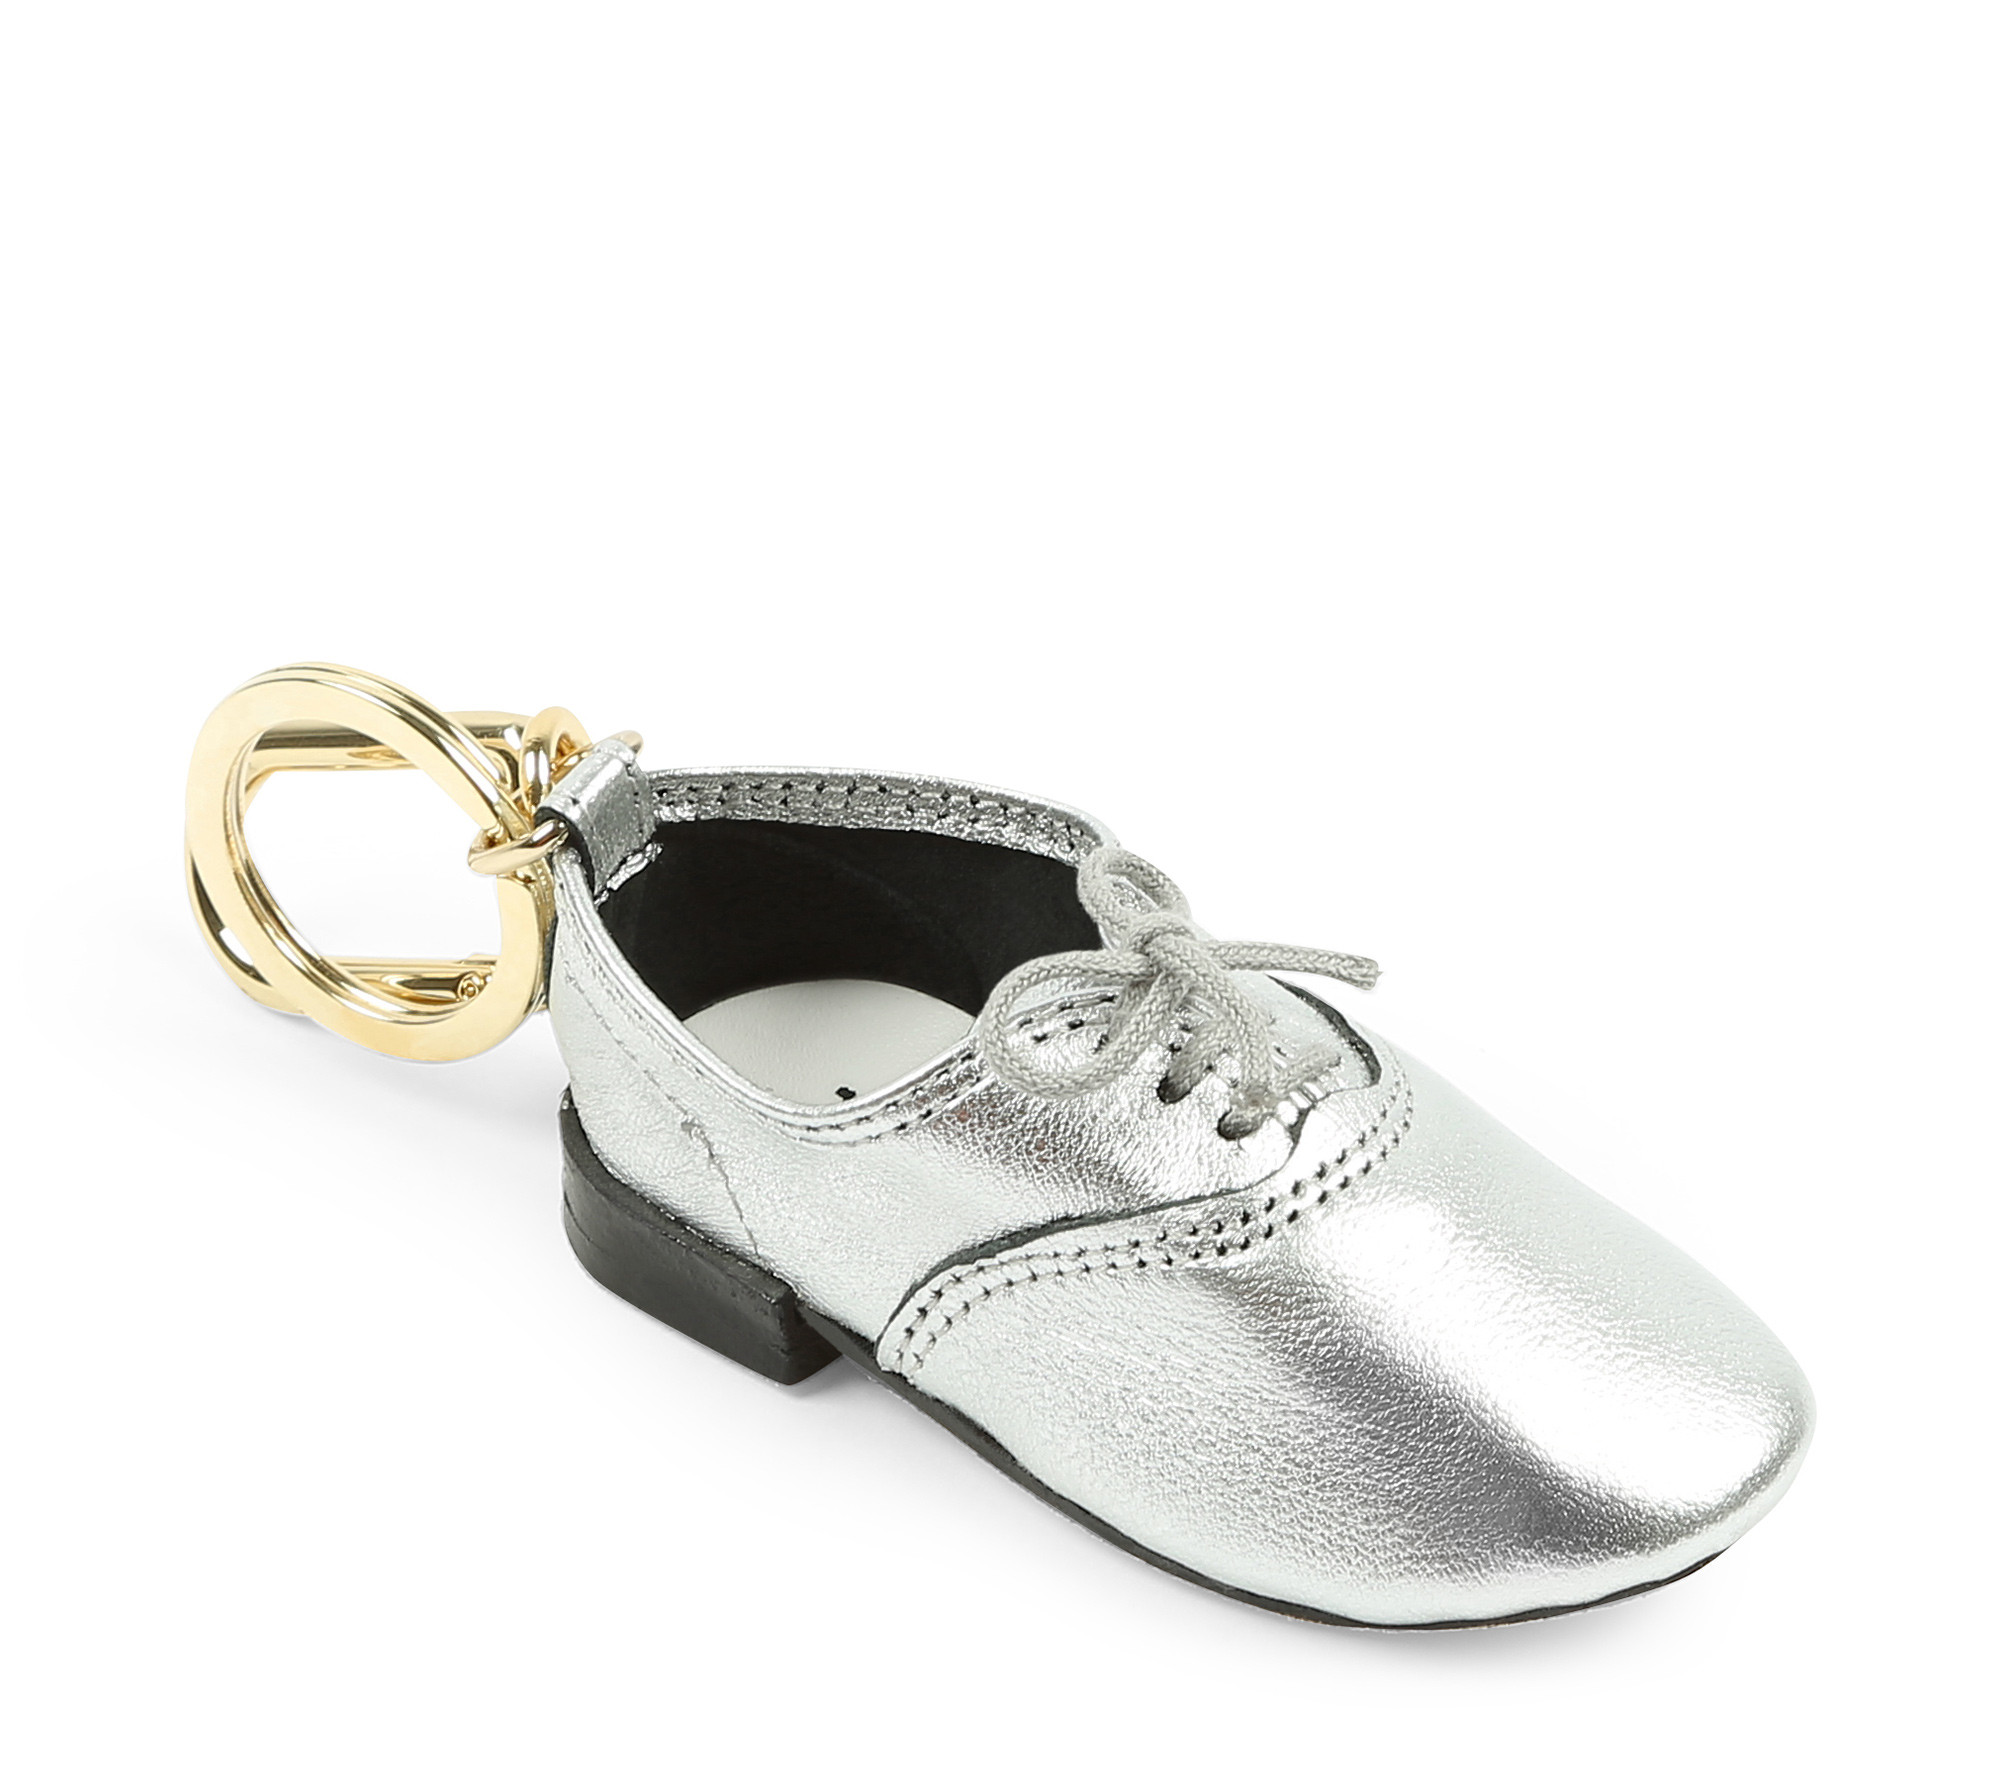 Zizi key ring